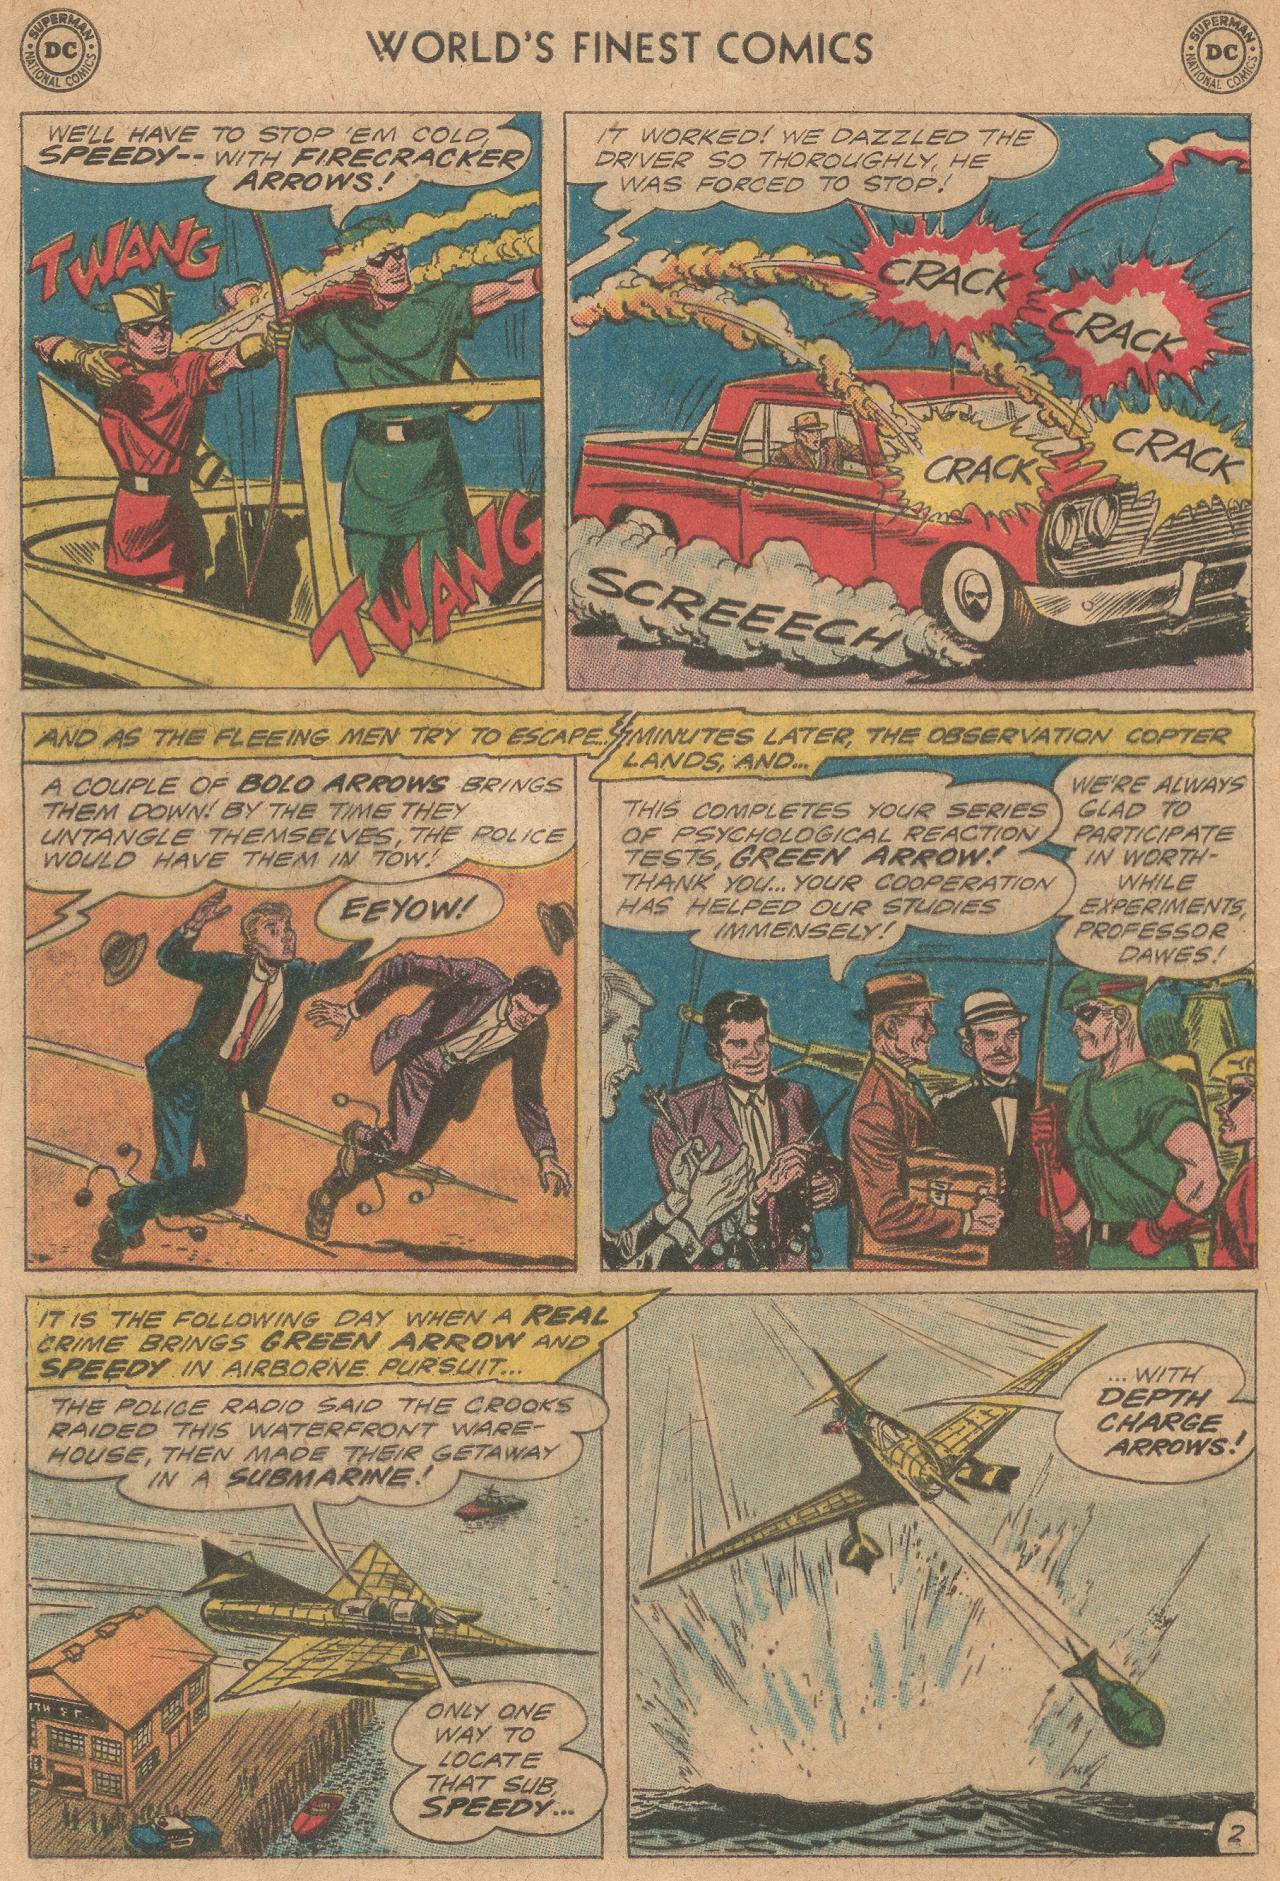 Read online World's Finest Comics comic -  Issue #126 - 25